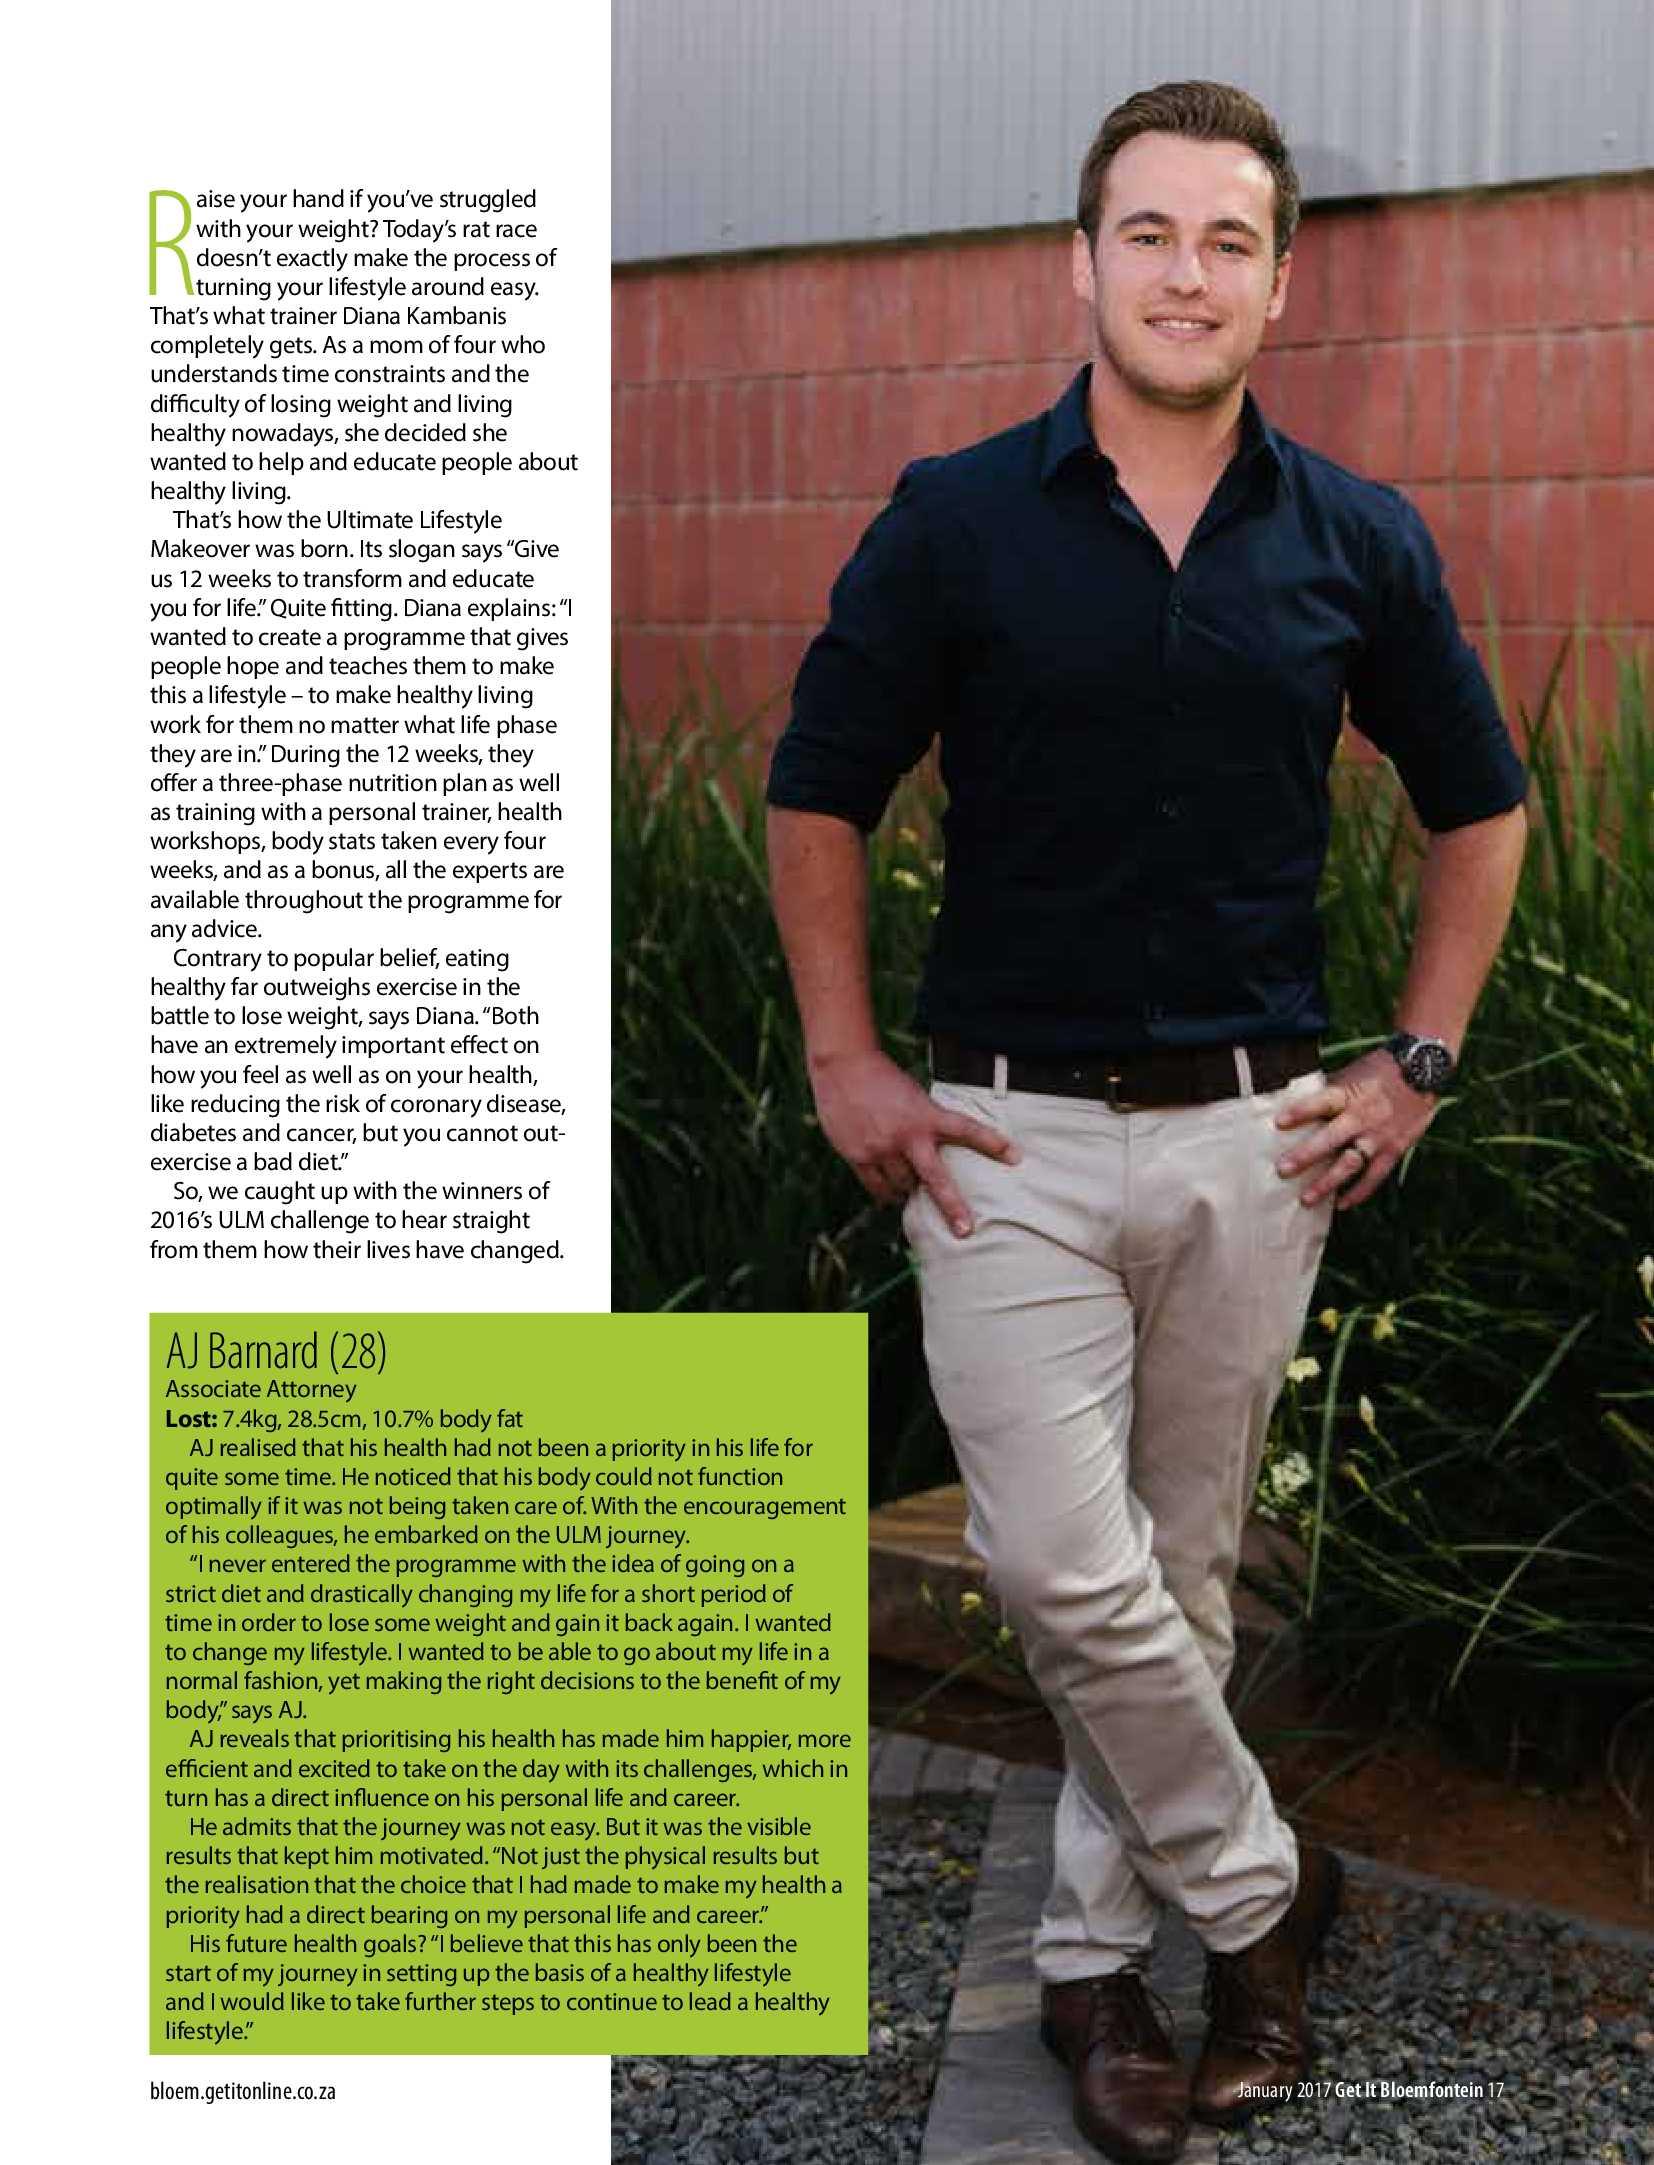 bloemfontein-getit-january-2017-epapers-page-17